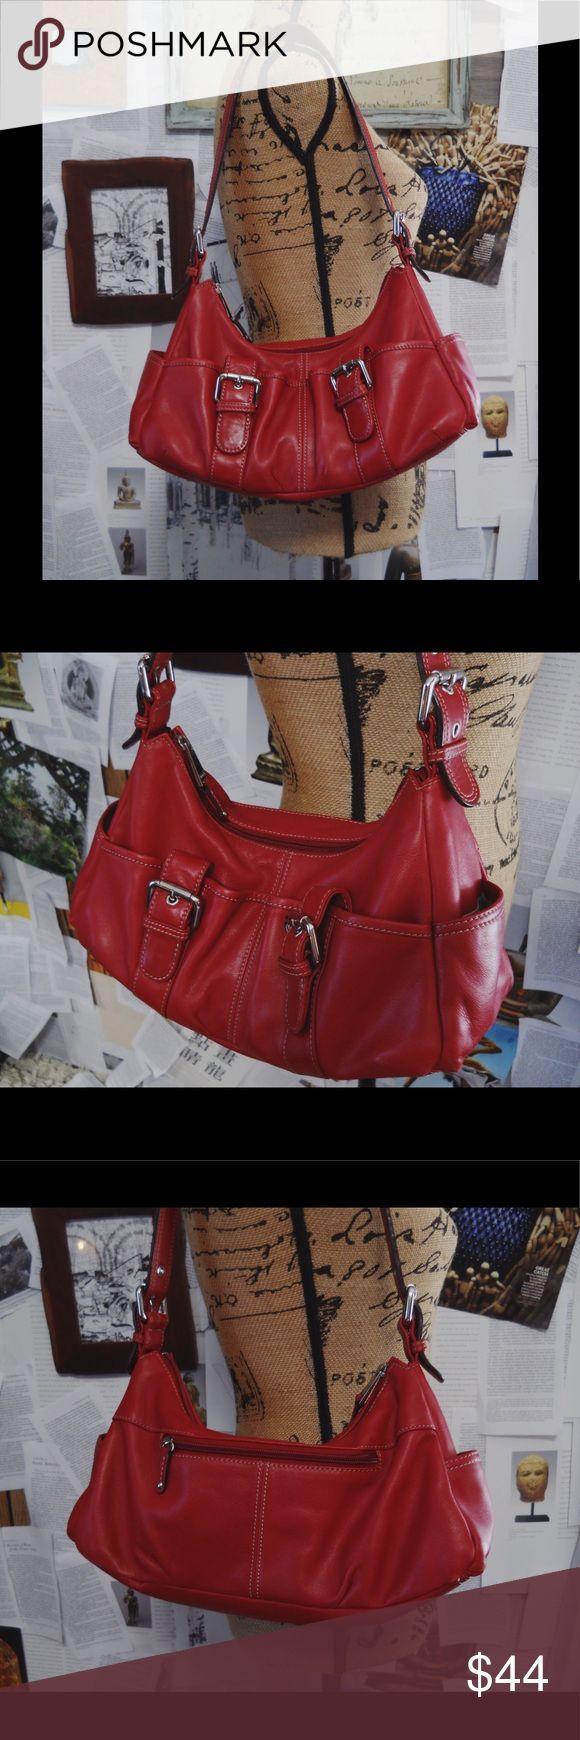 Selling this Red Leather Buckle Bag on Poshmark! My username is: terfner. #shopmycloset #poshmark #fashion #shopping #style #forsale #Tignanello #Handbags